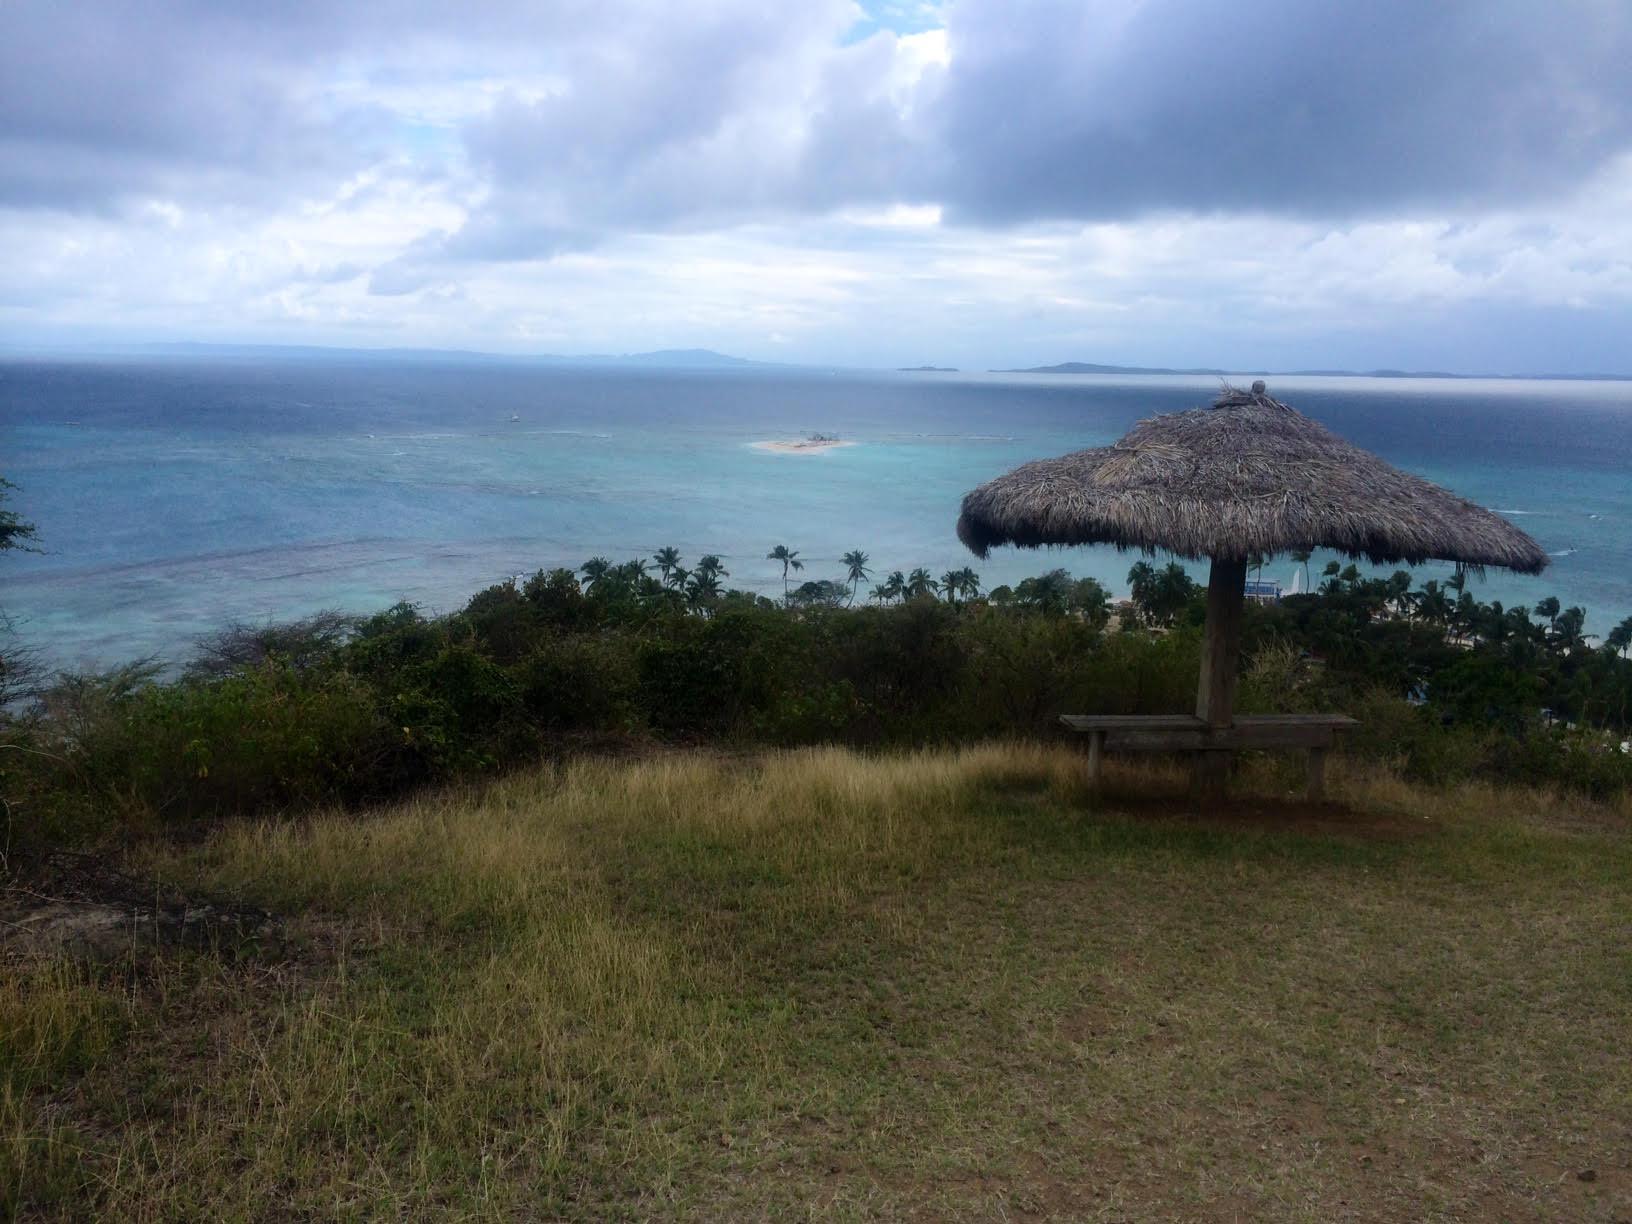 On top of Palomino Island looking towards Palominito Island